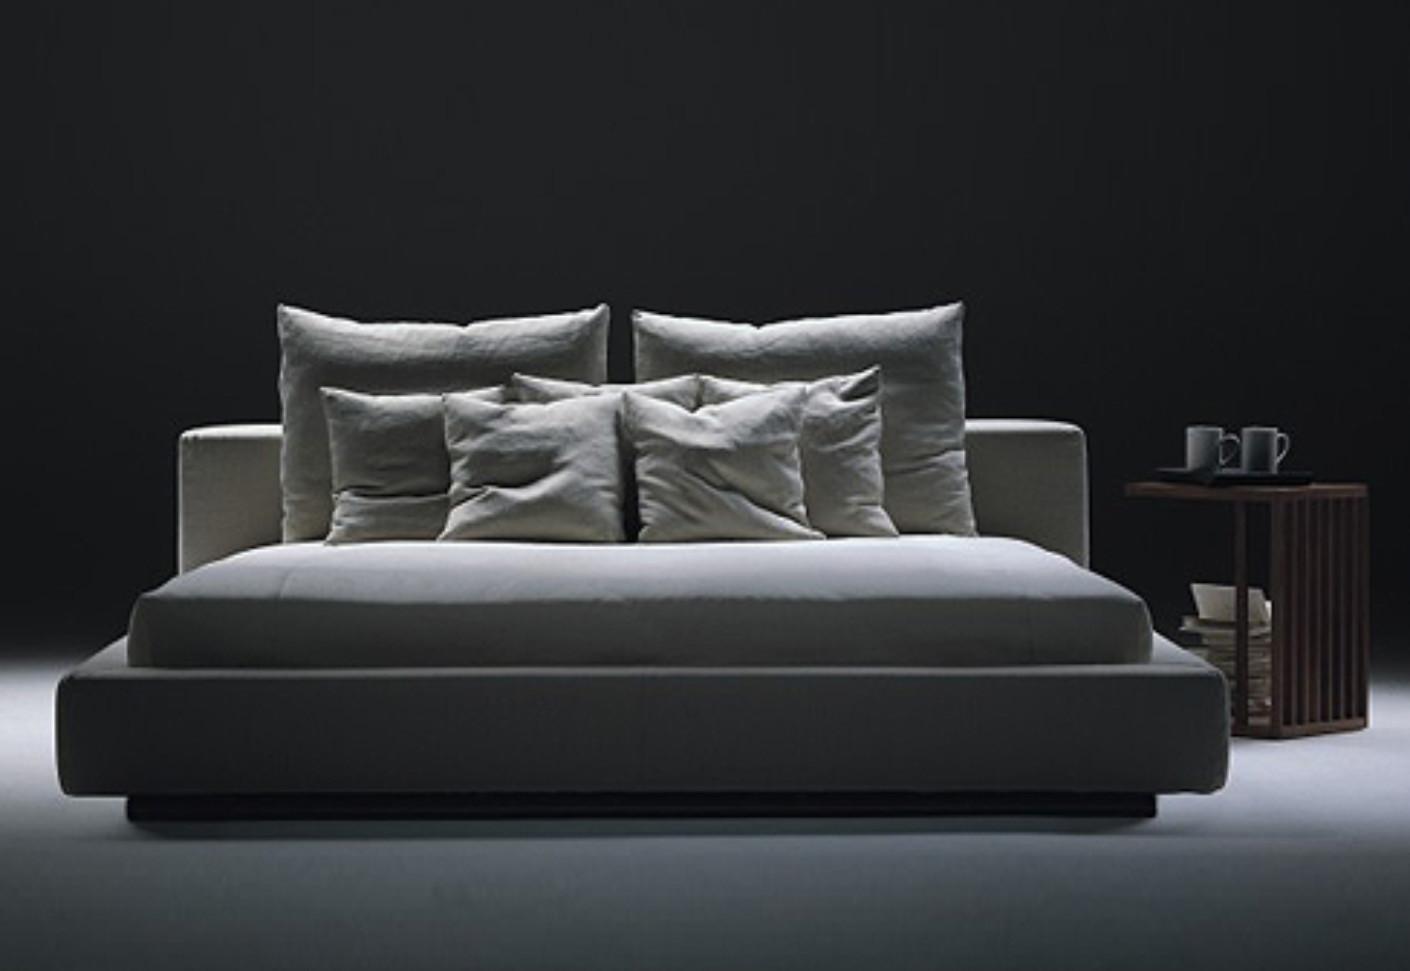 Groundpiece bed by flexform stylepark for Flexform groundpiece